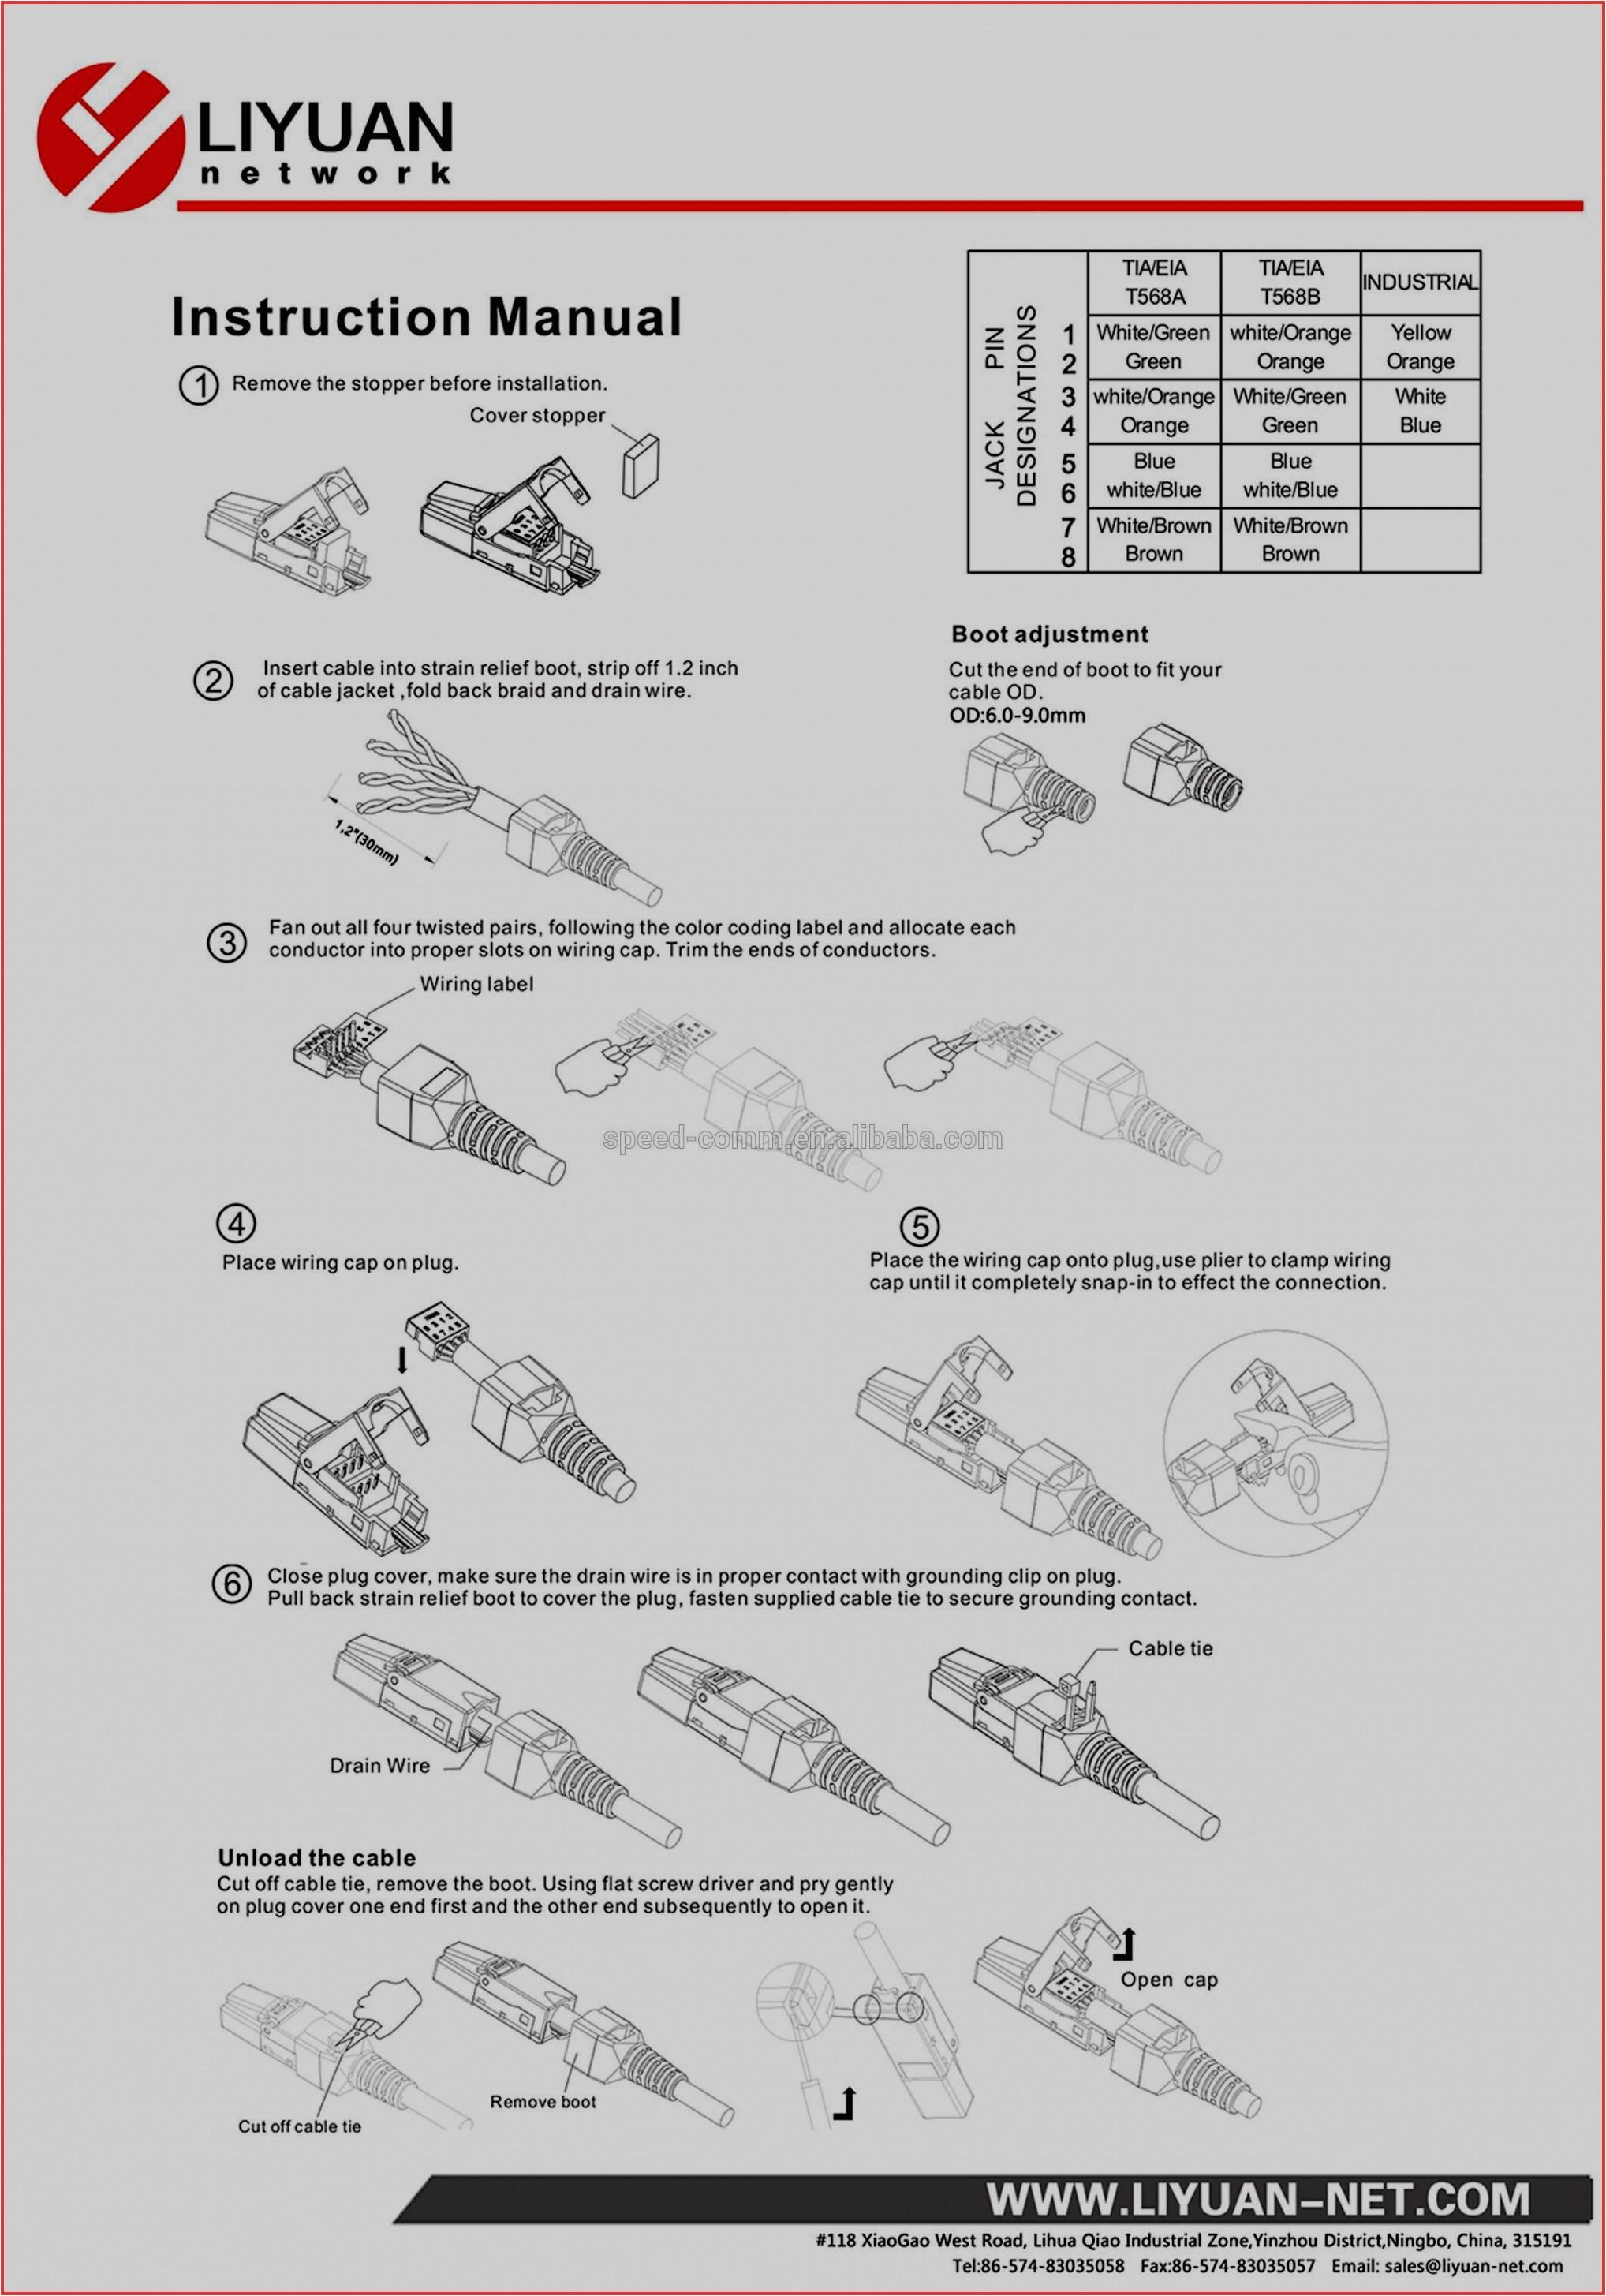 6 Wire Motor Wiring Diagram Structured Wiring Cat6 Wiring Diagram Database